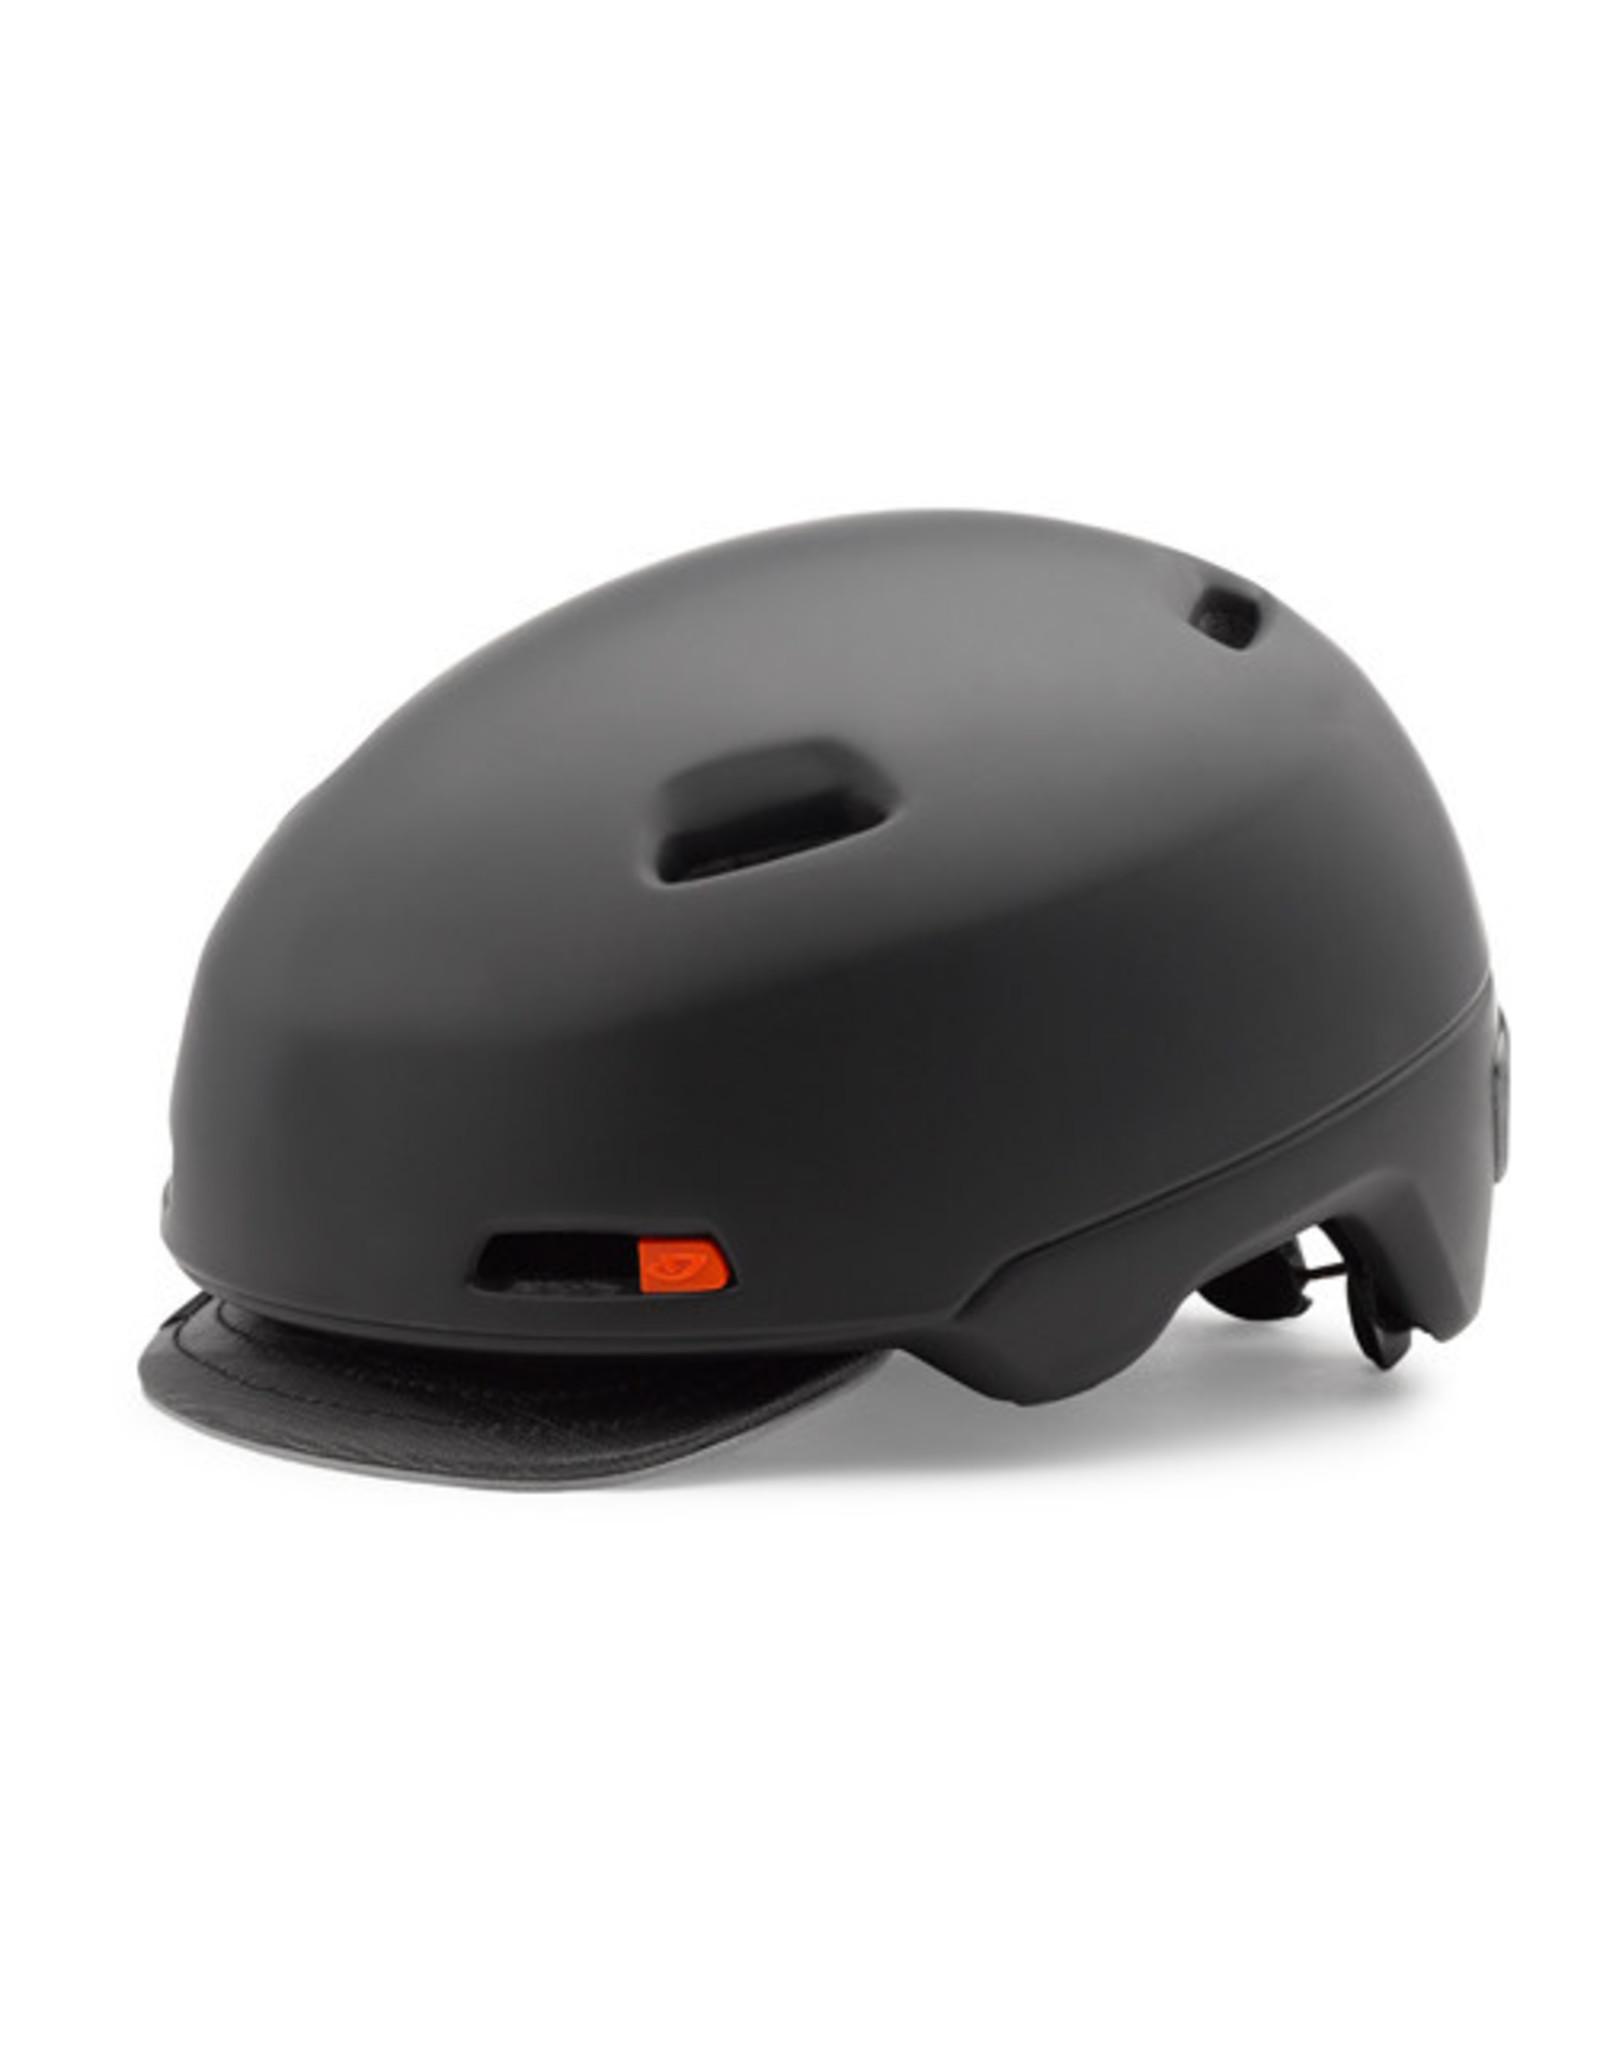 Helmet - Giro Sutton MIPS, Matte Black, Small